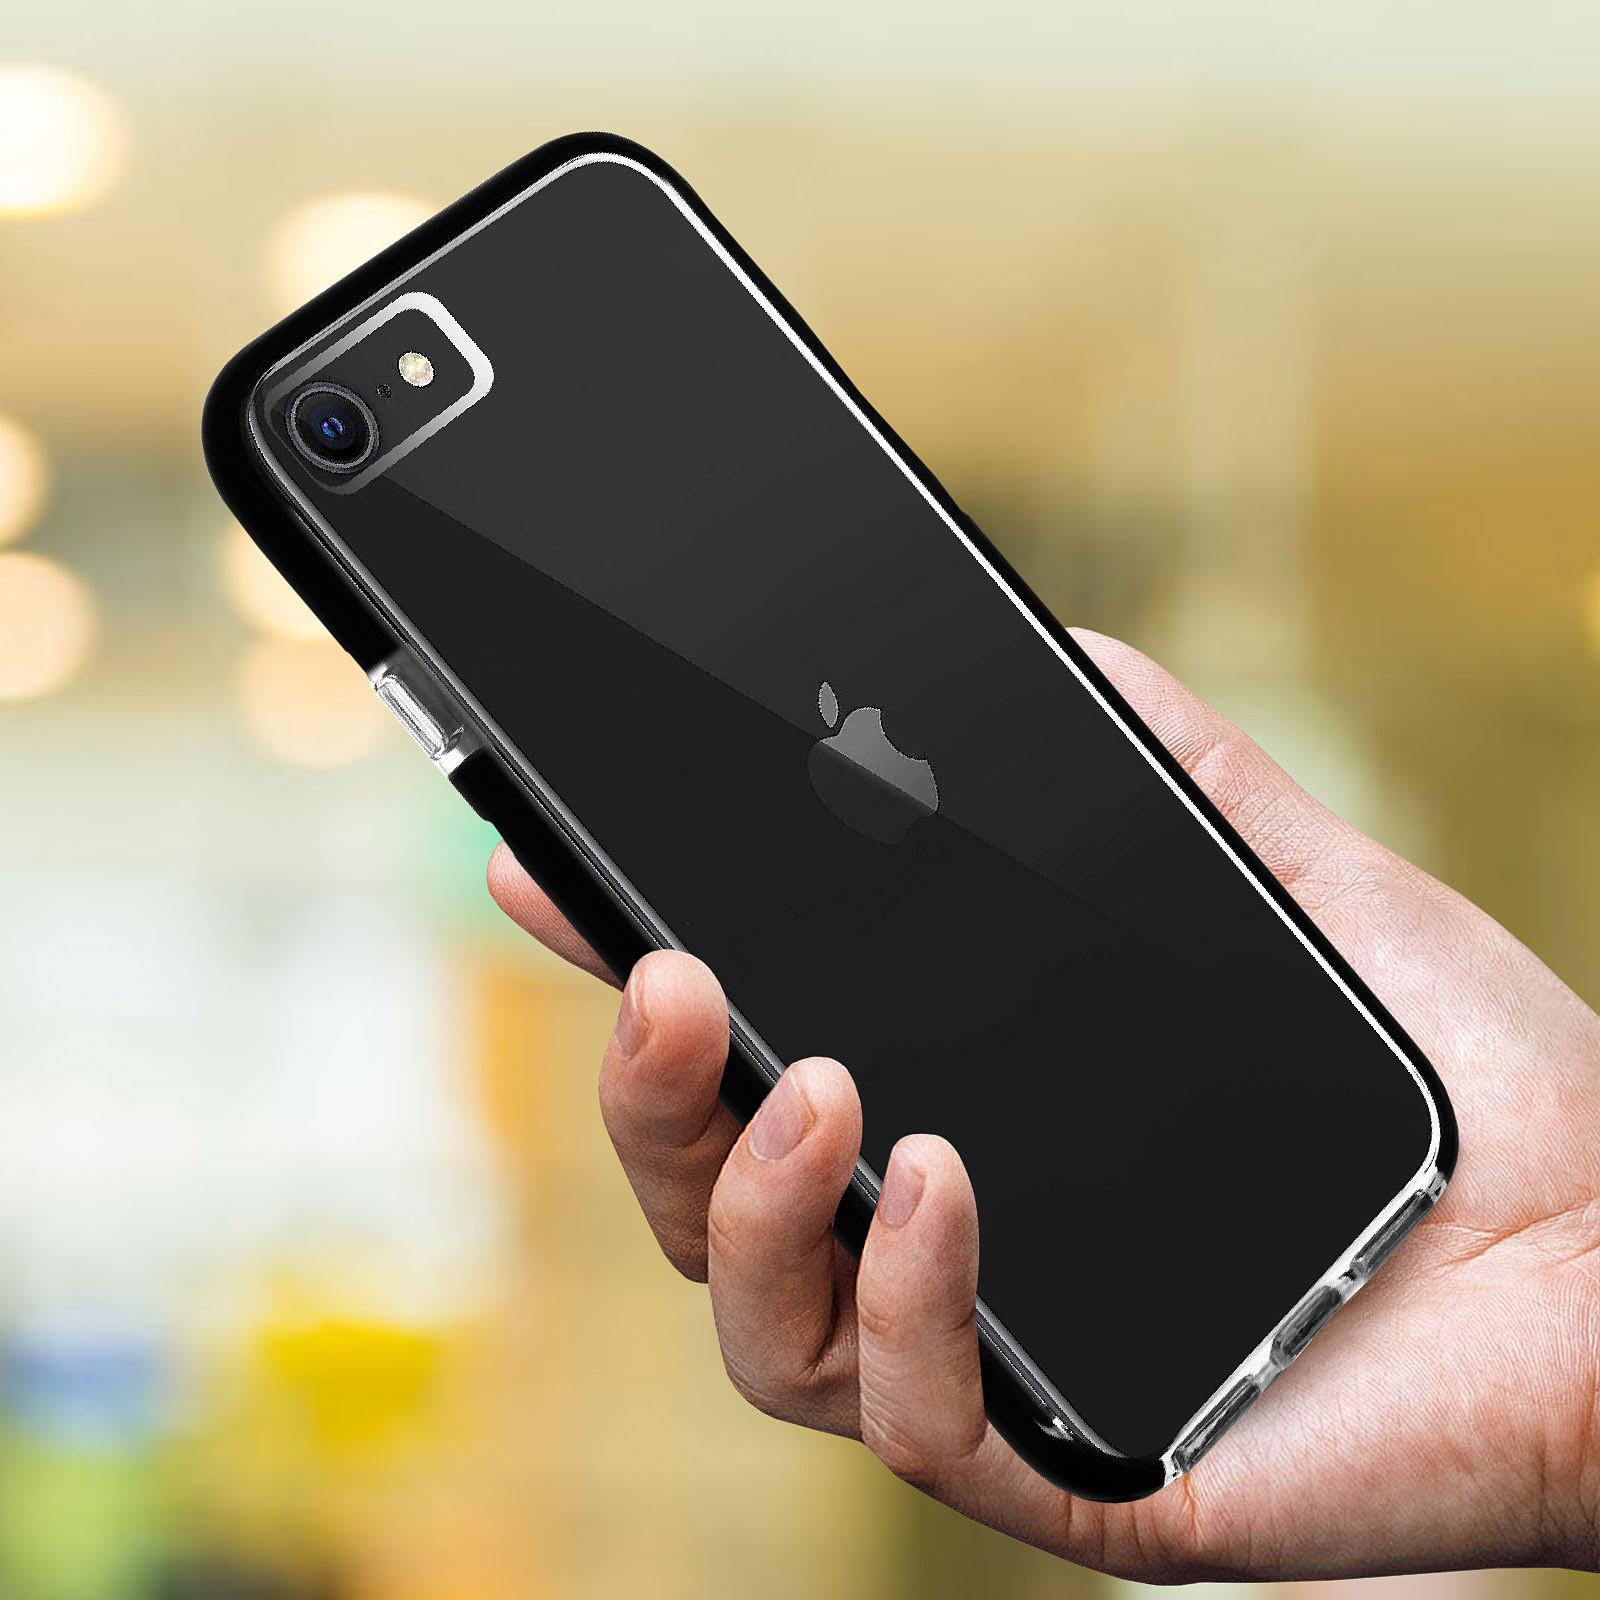 Akashi Coque TPU Ultra Renforcée Apple iPhone SE / 6 / 7 / 8